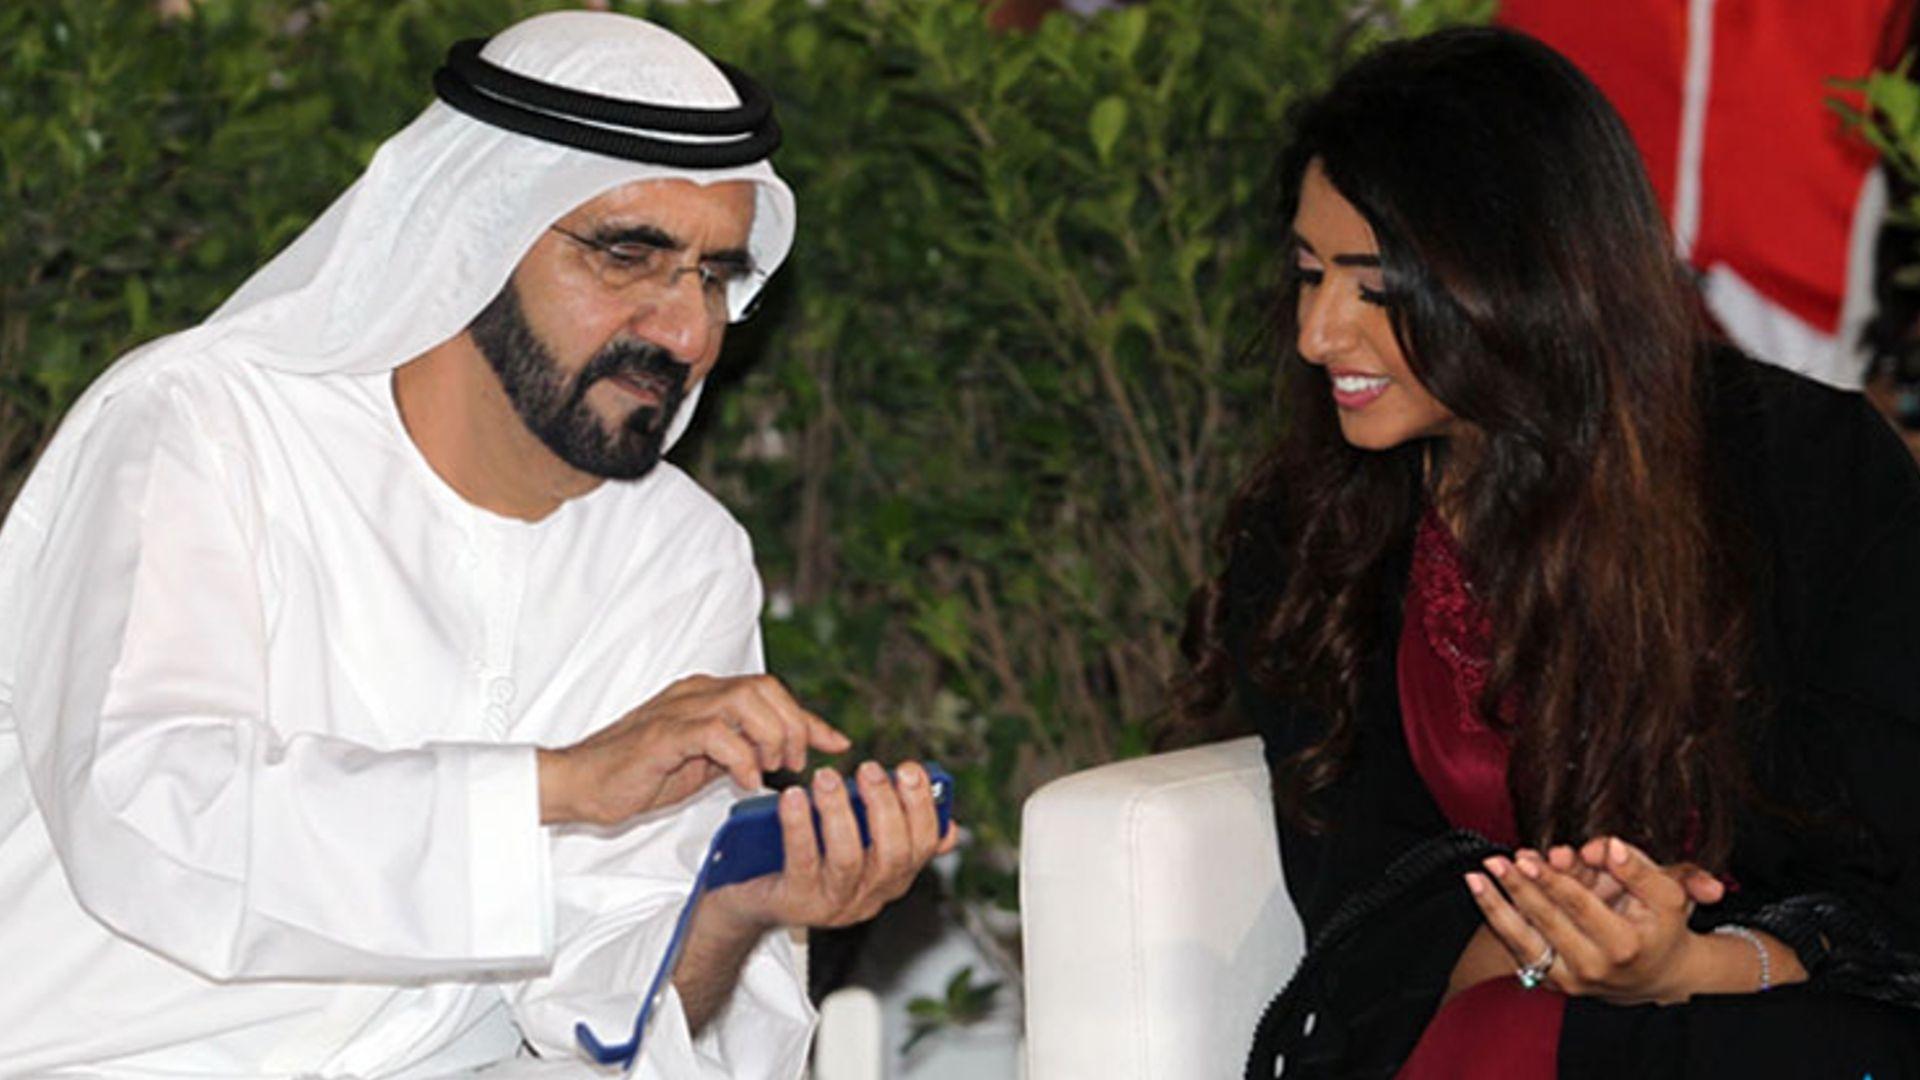 Sheikh Mohammed's Daughter, Sheikha Maryam, Just Got Married